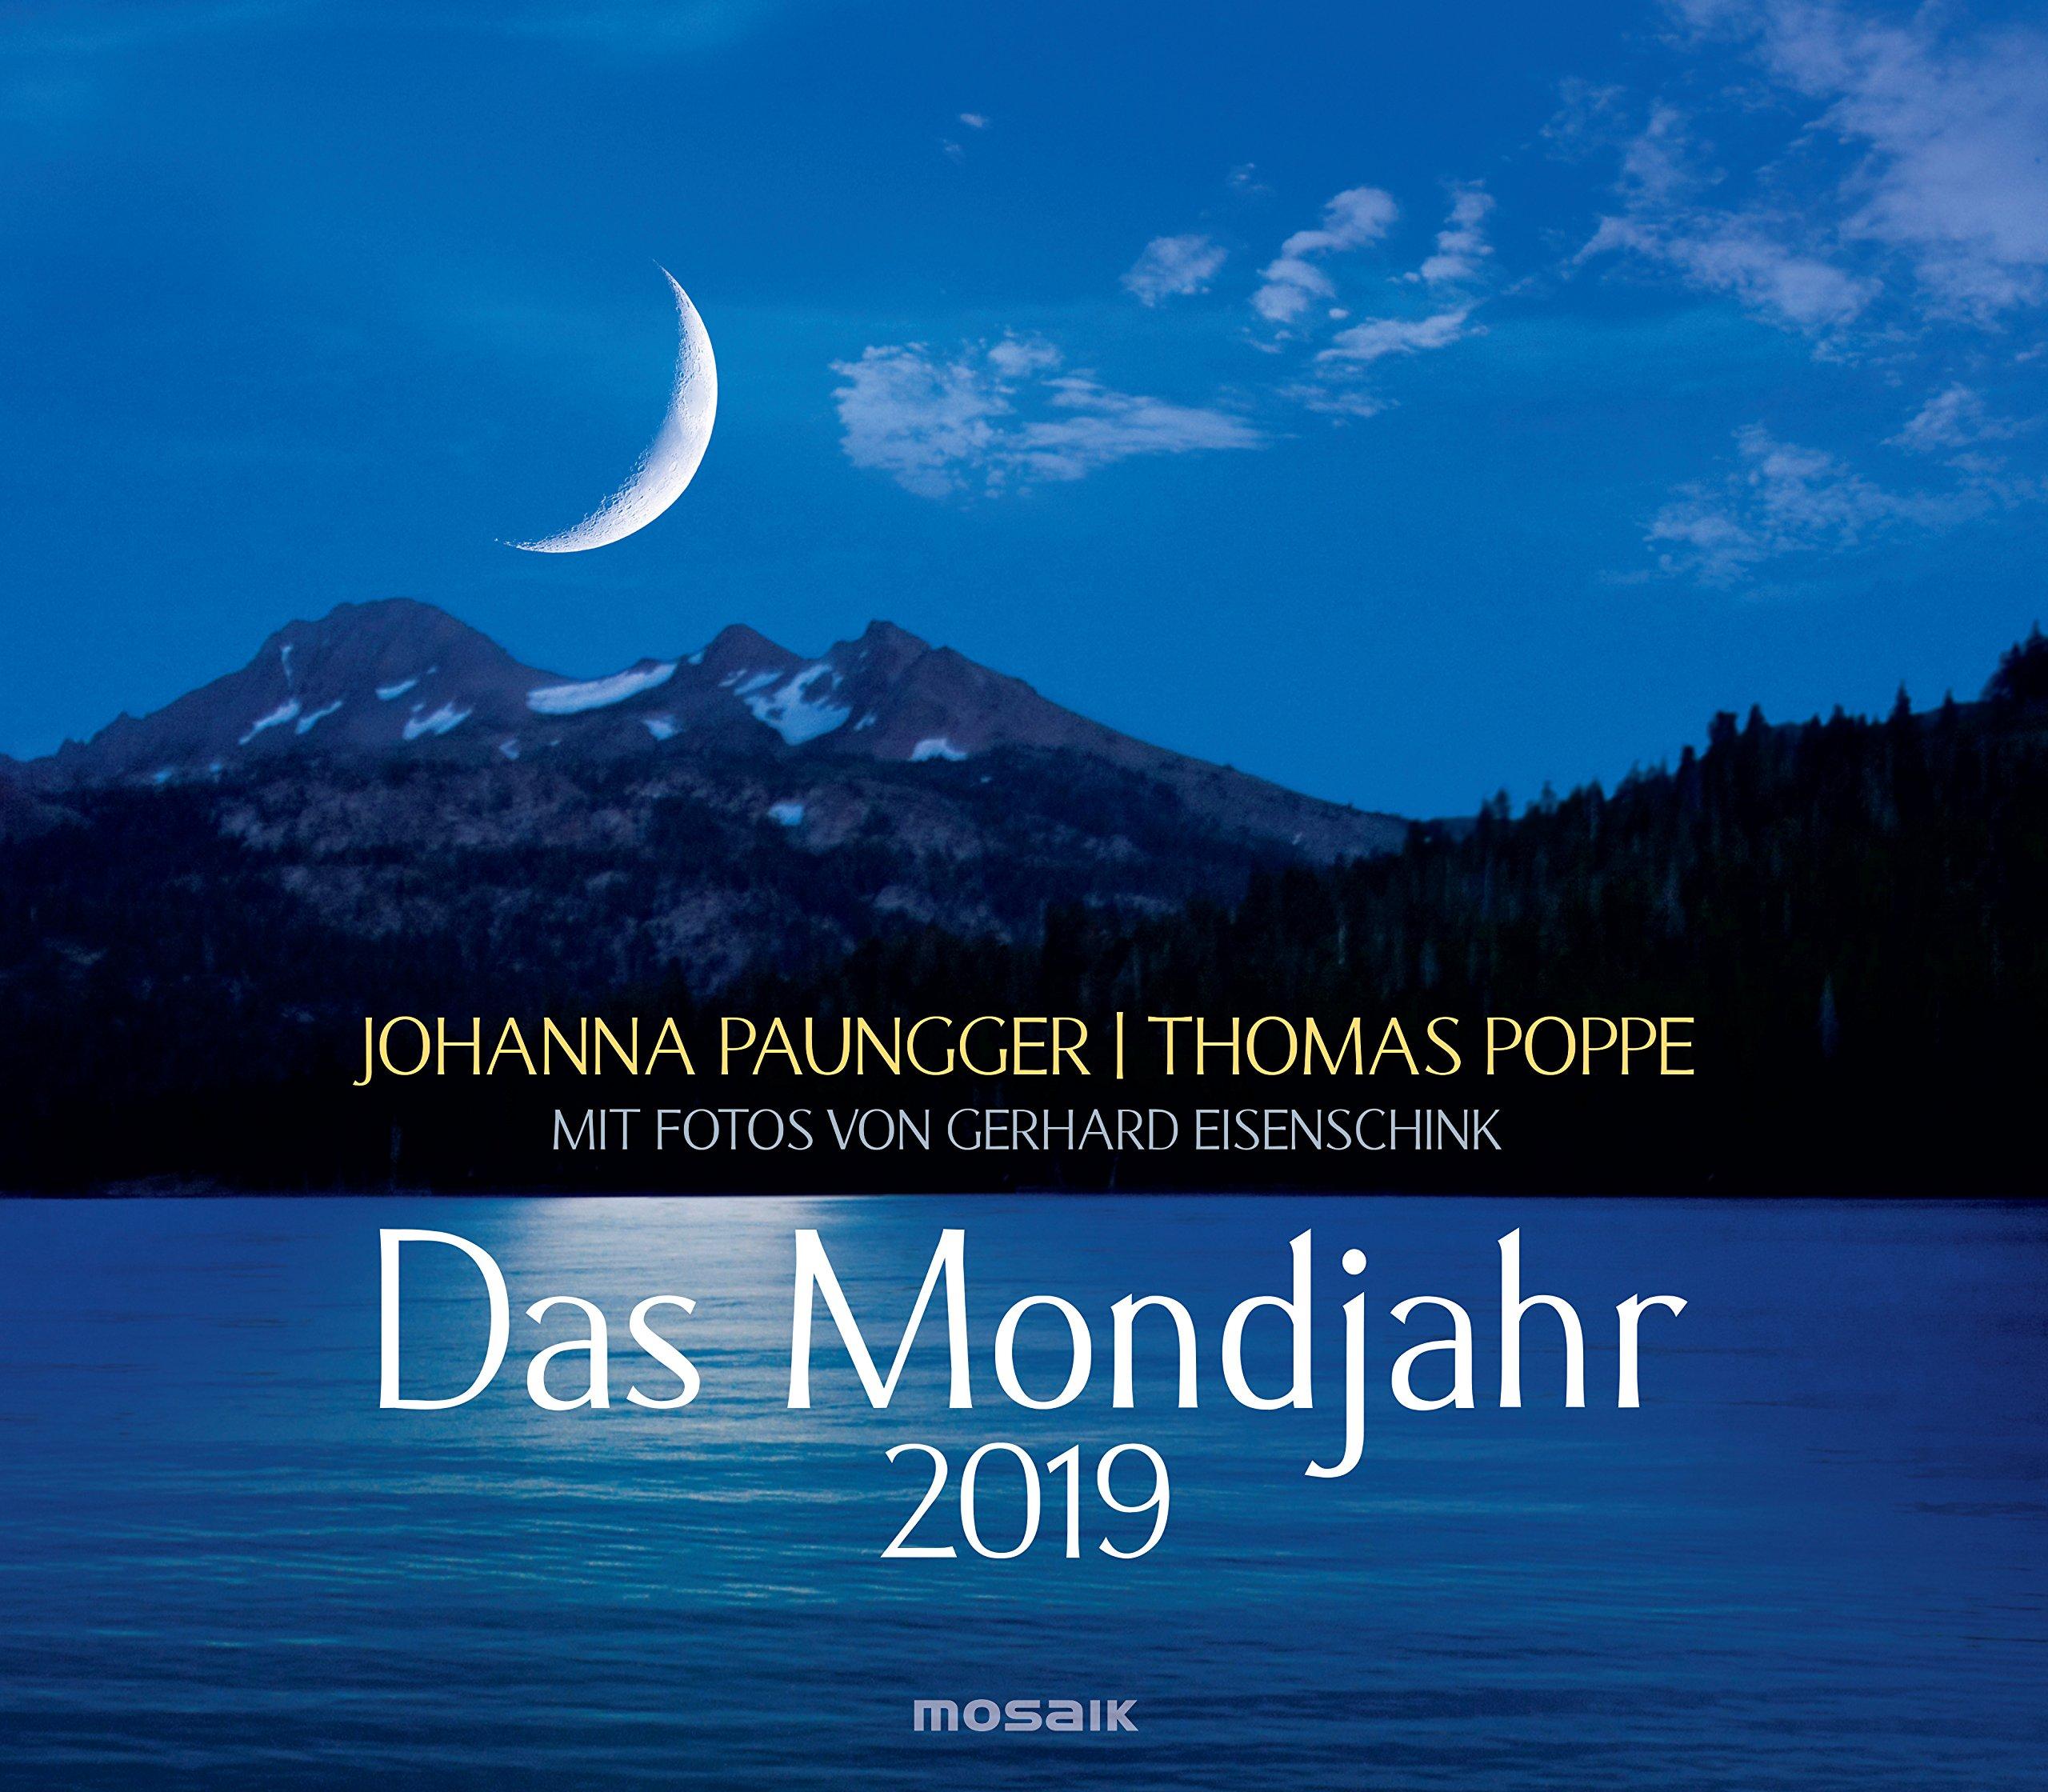 Das Mondjahr 2019: Wandkalender mit Fotos von Gerhard Eisenschink - Das Original Kalender – Wandkalender, 4. Juni 2018 Johanna Paungger Thomas Poppe Mosaik 3442319072